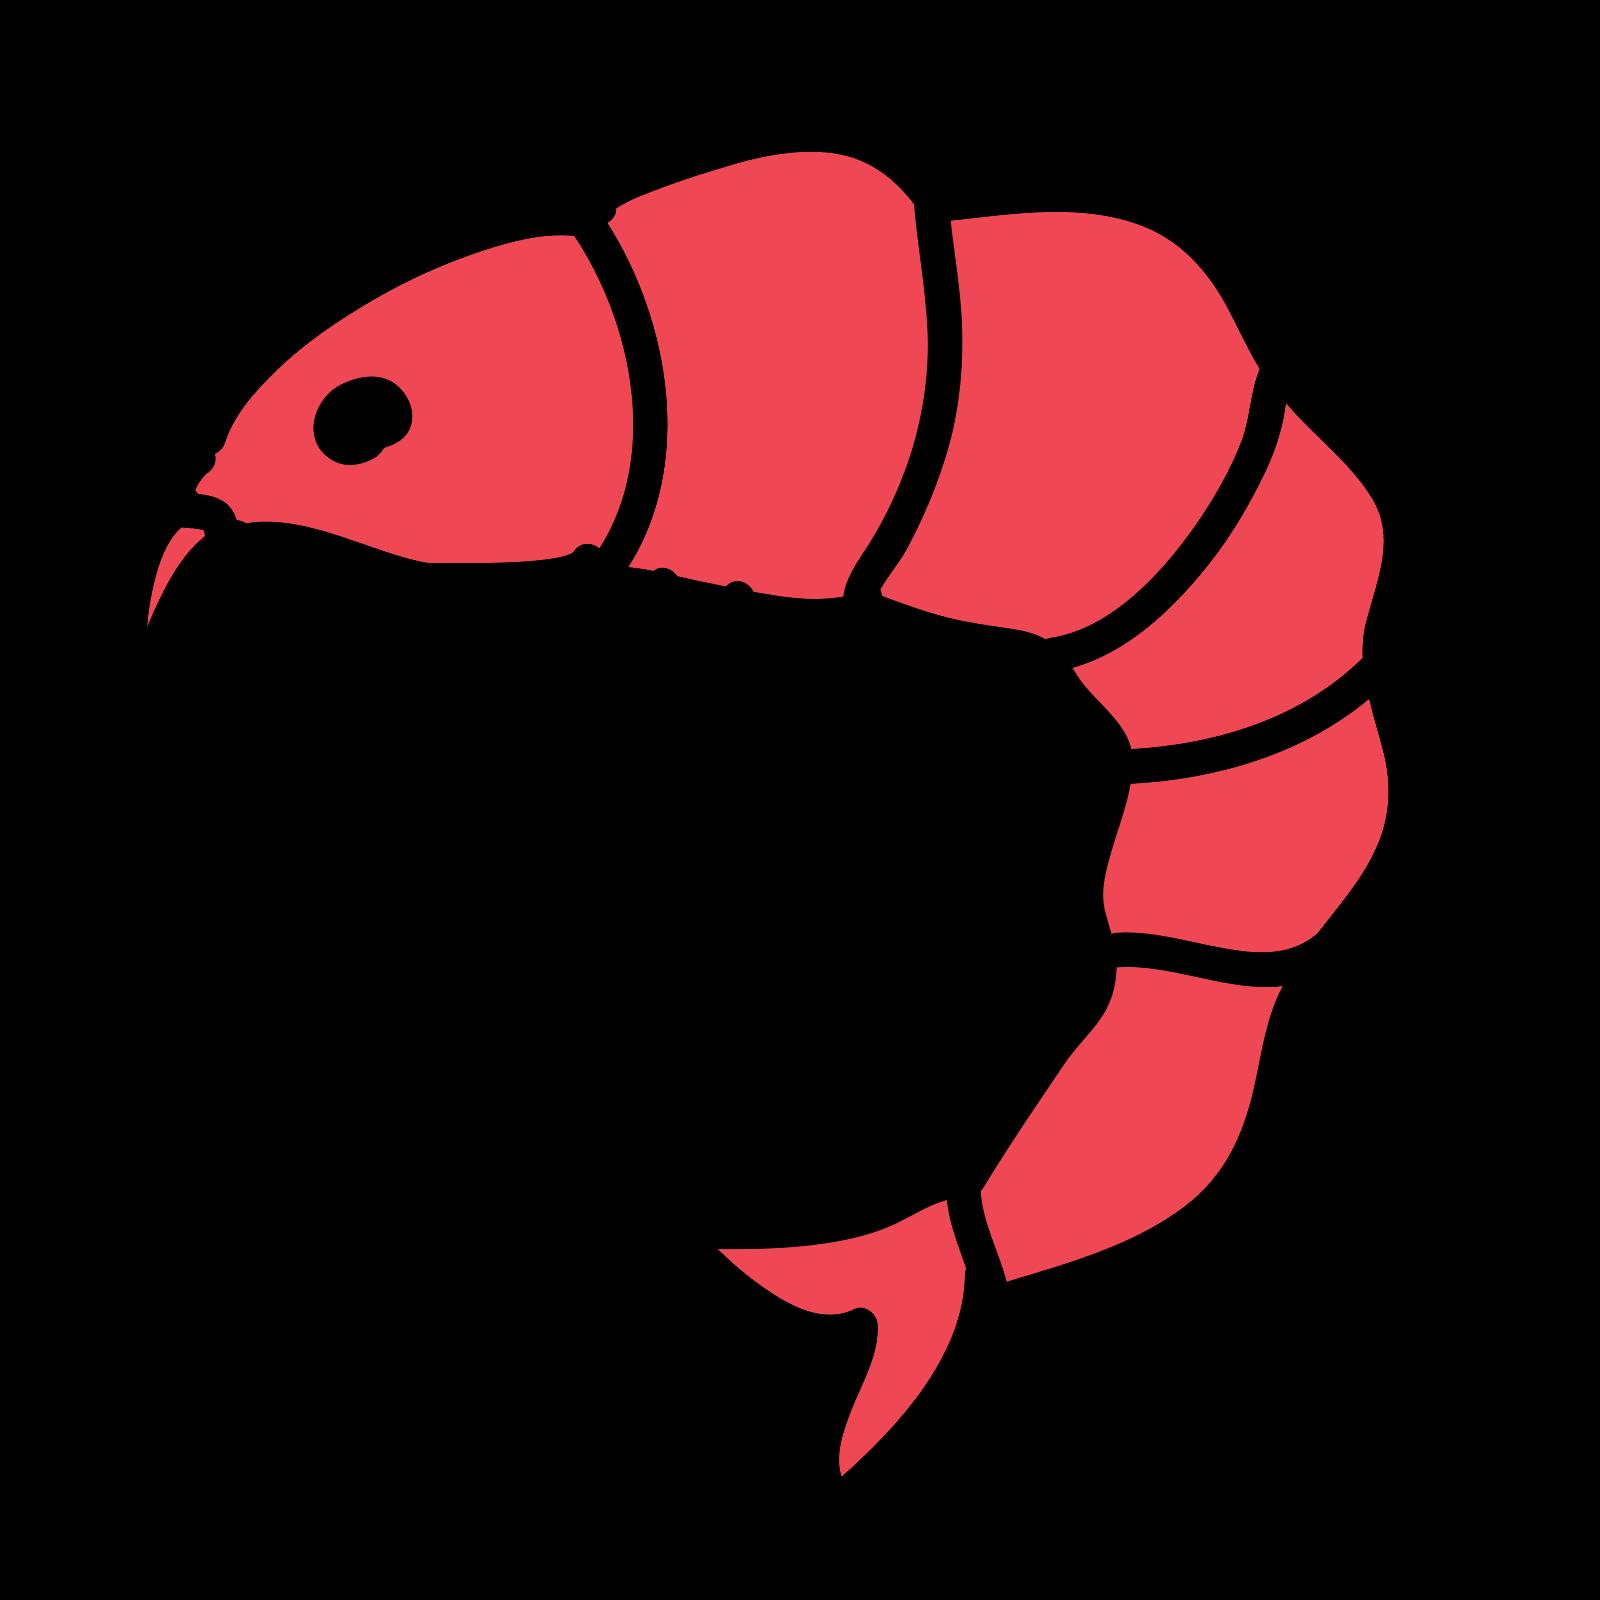 Krewetka icon